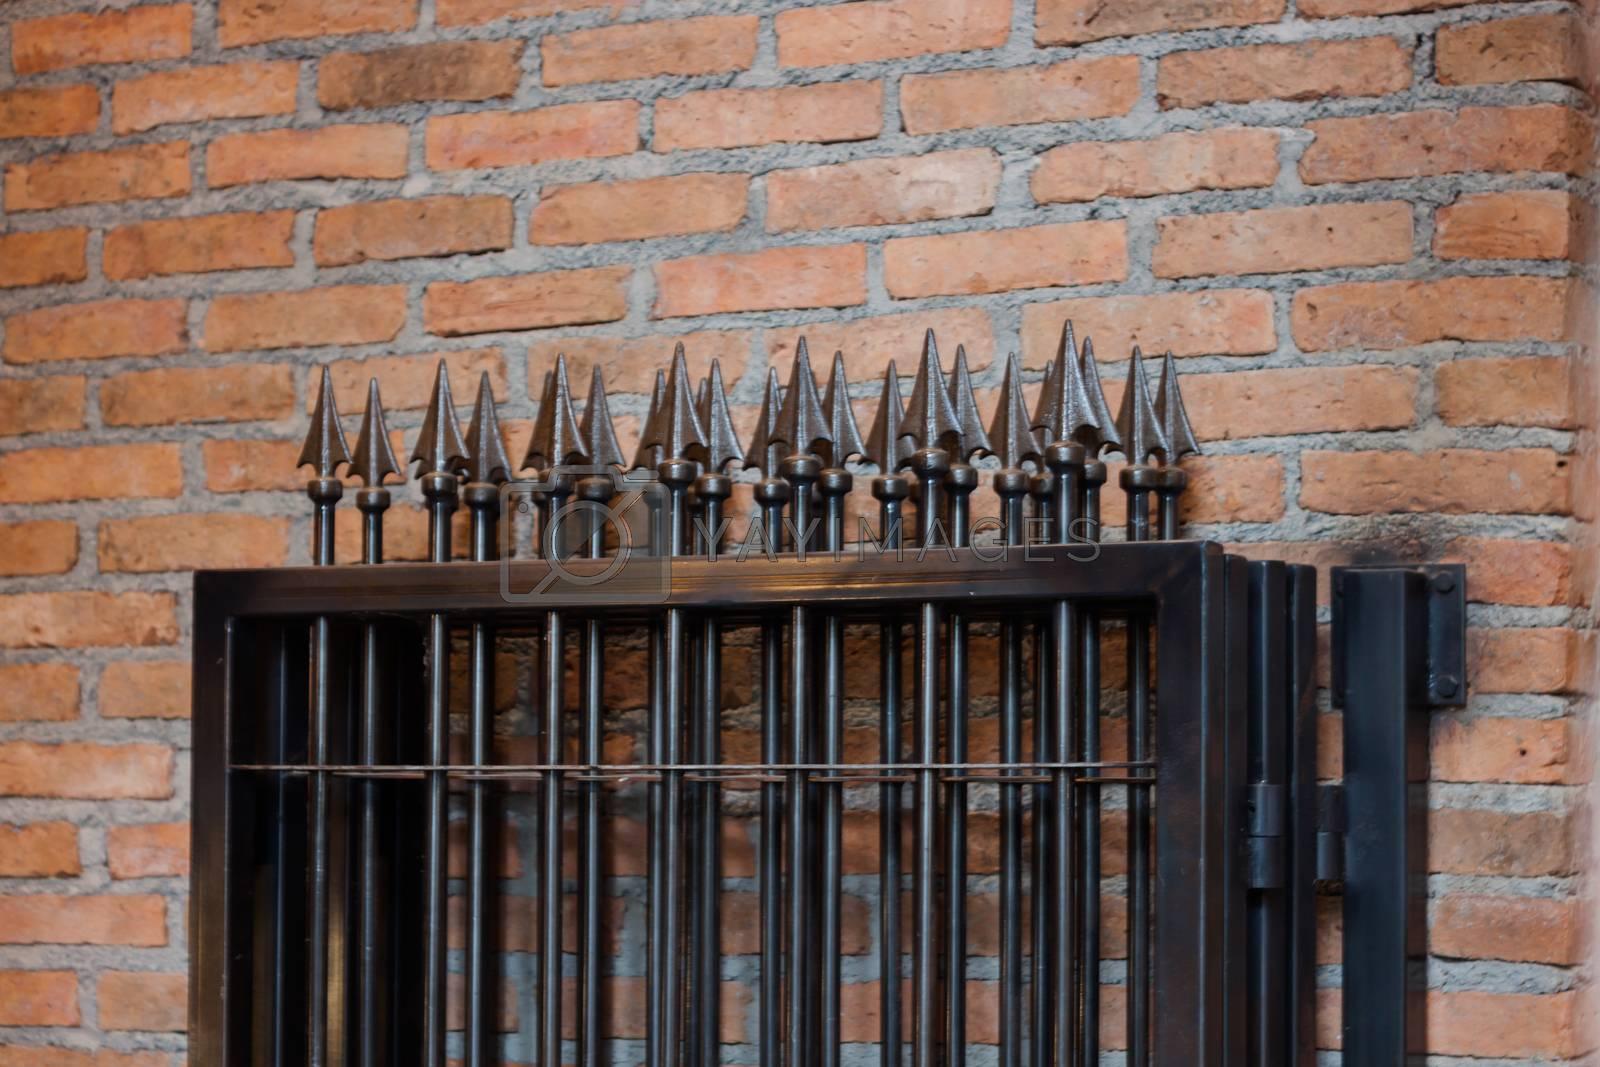 Aluminum Fence in private zone, stock photo